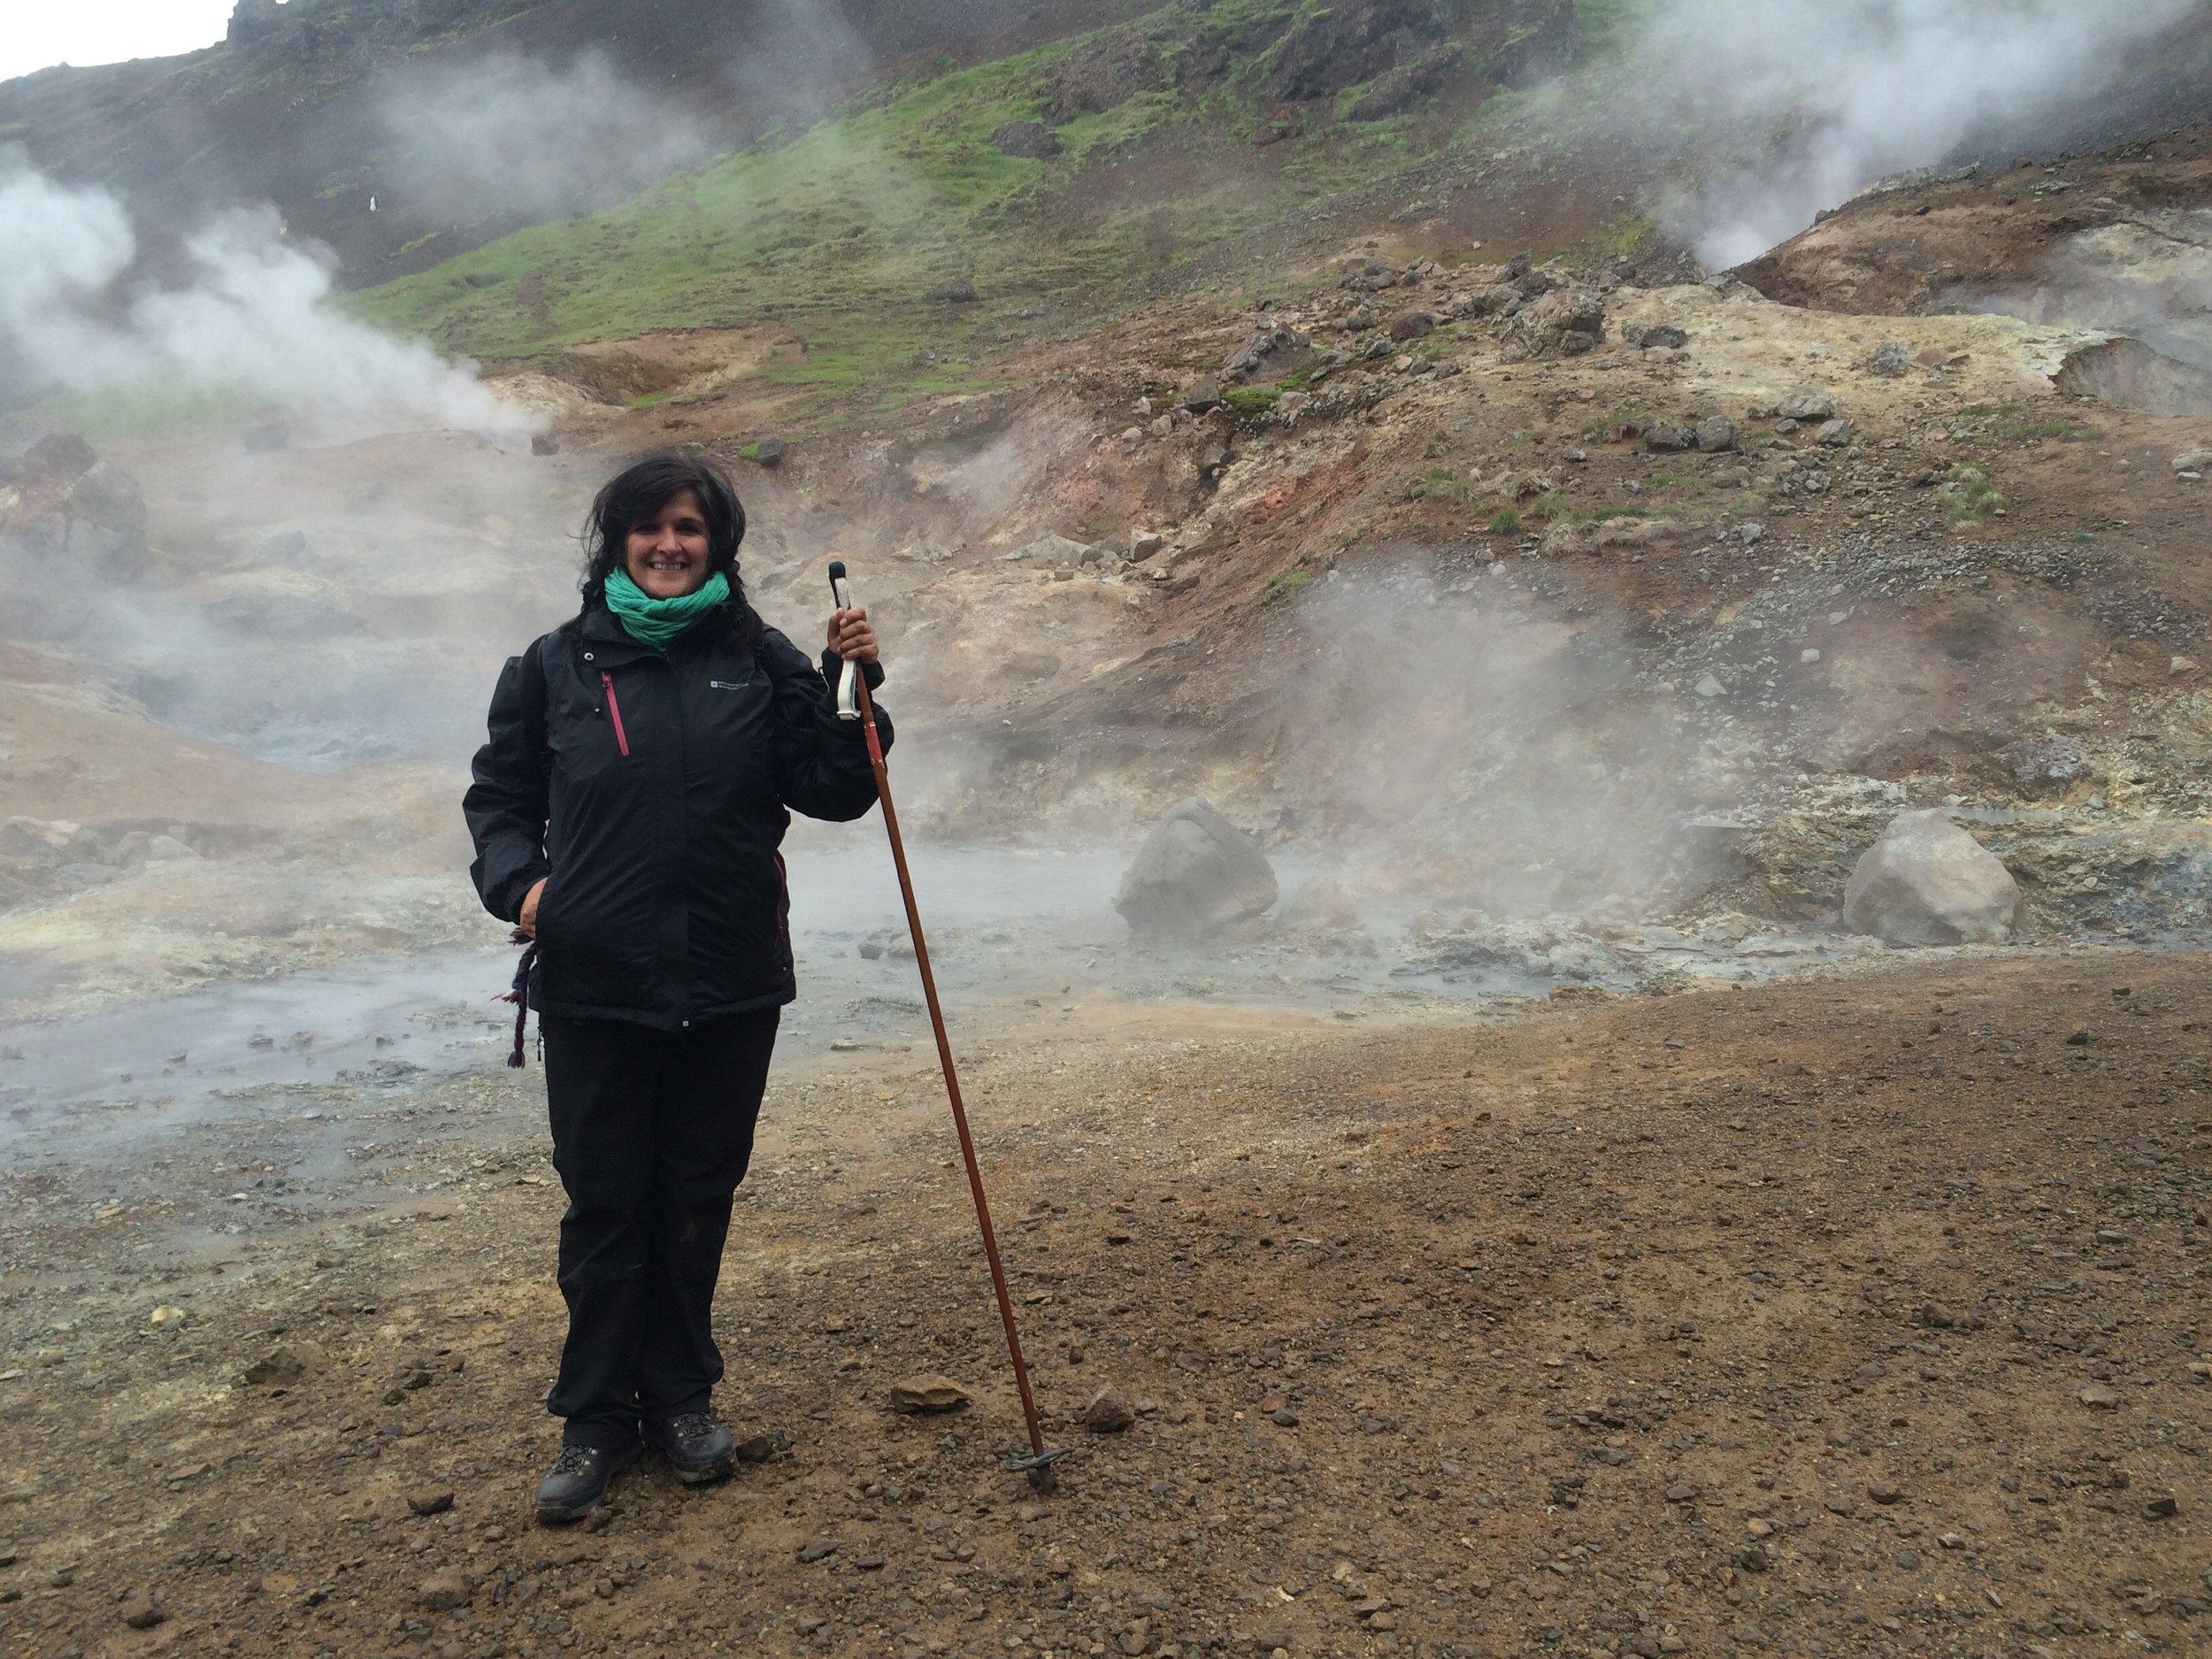 volcano hike with bad hair